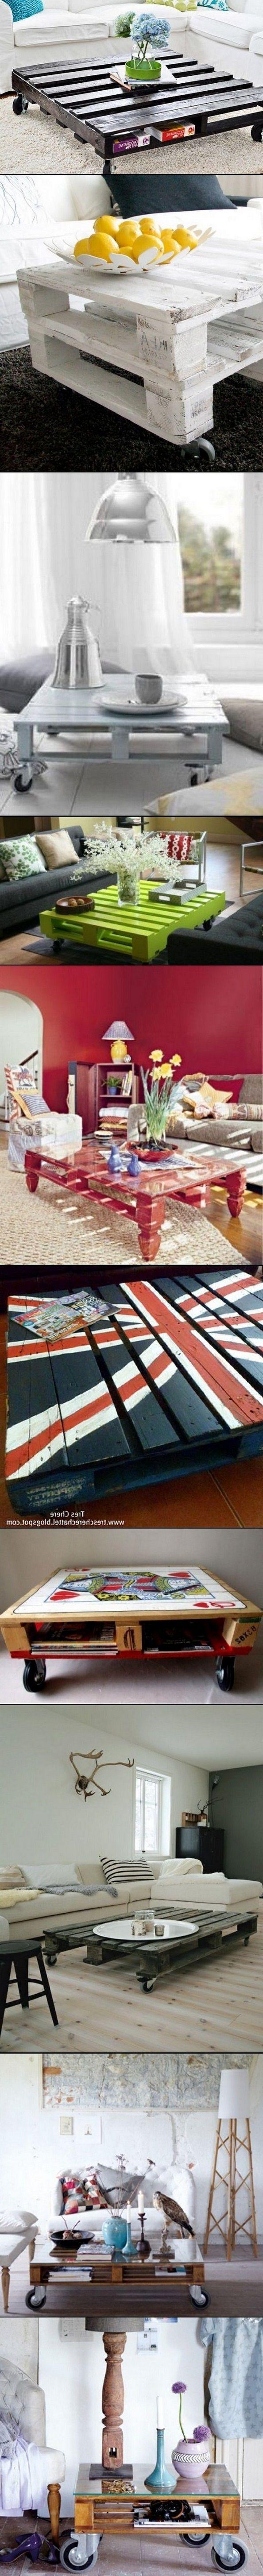 DIY Home Decorating Ideas | Dump A Day Amazing Easy DIY Home Decor Ideas- old dresser seat - Dump ...